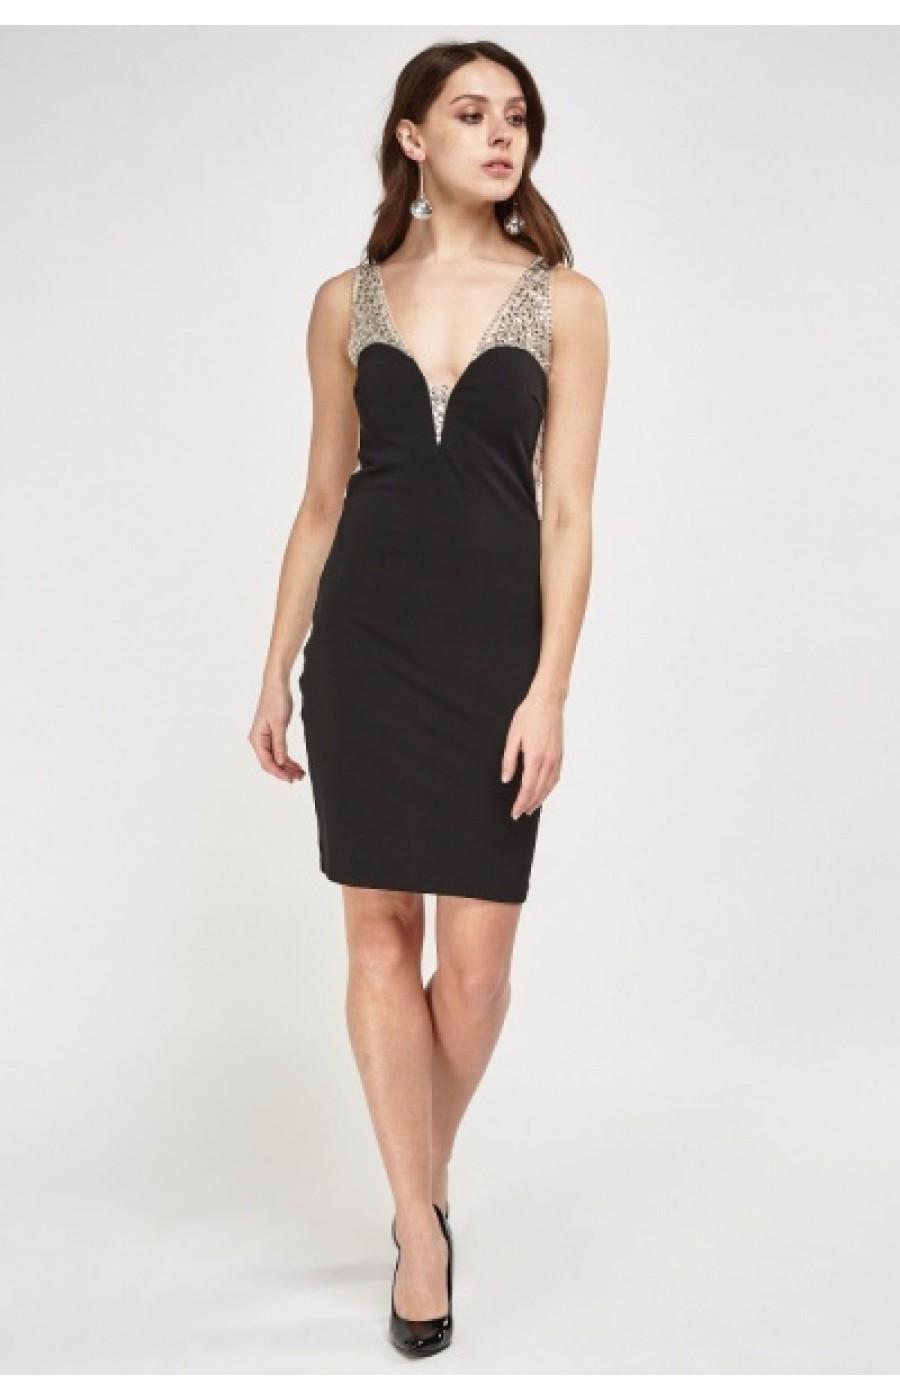 34e7fa4b2057 Μαυρο κοντο φορεμα με διαφανεια και κεντημενα στρας